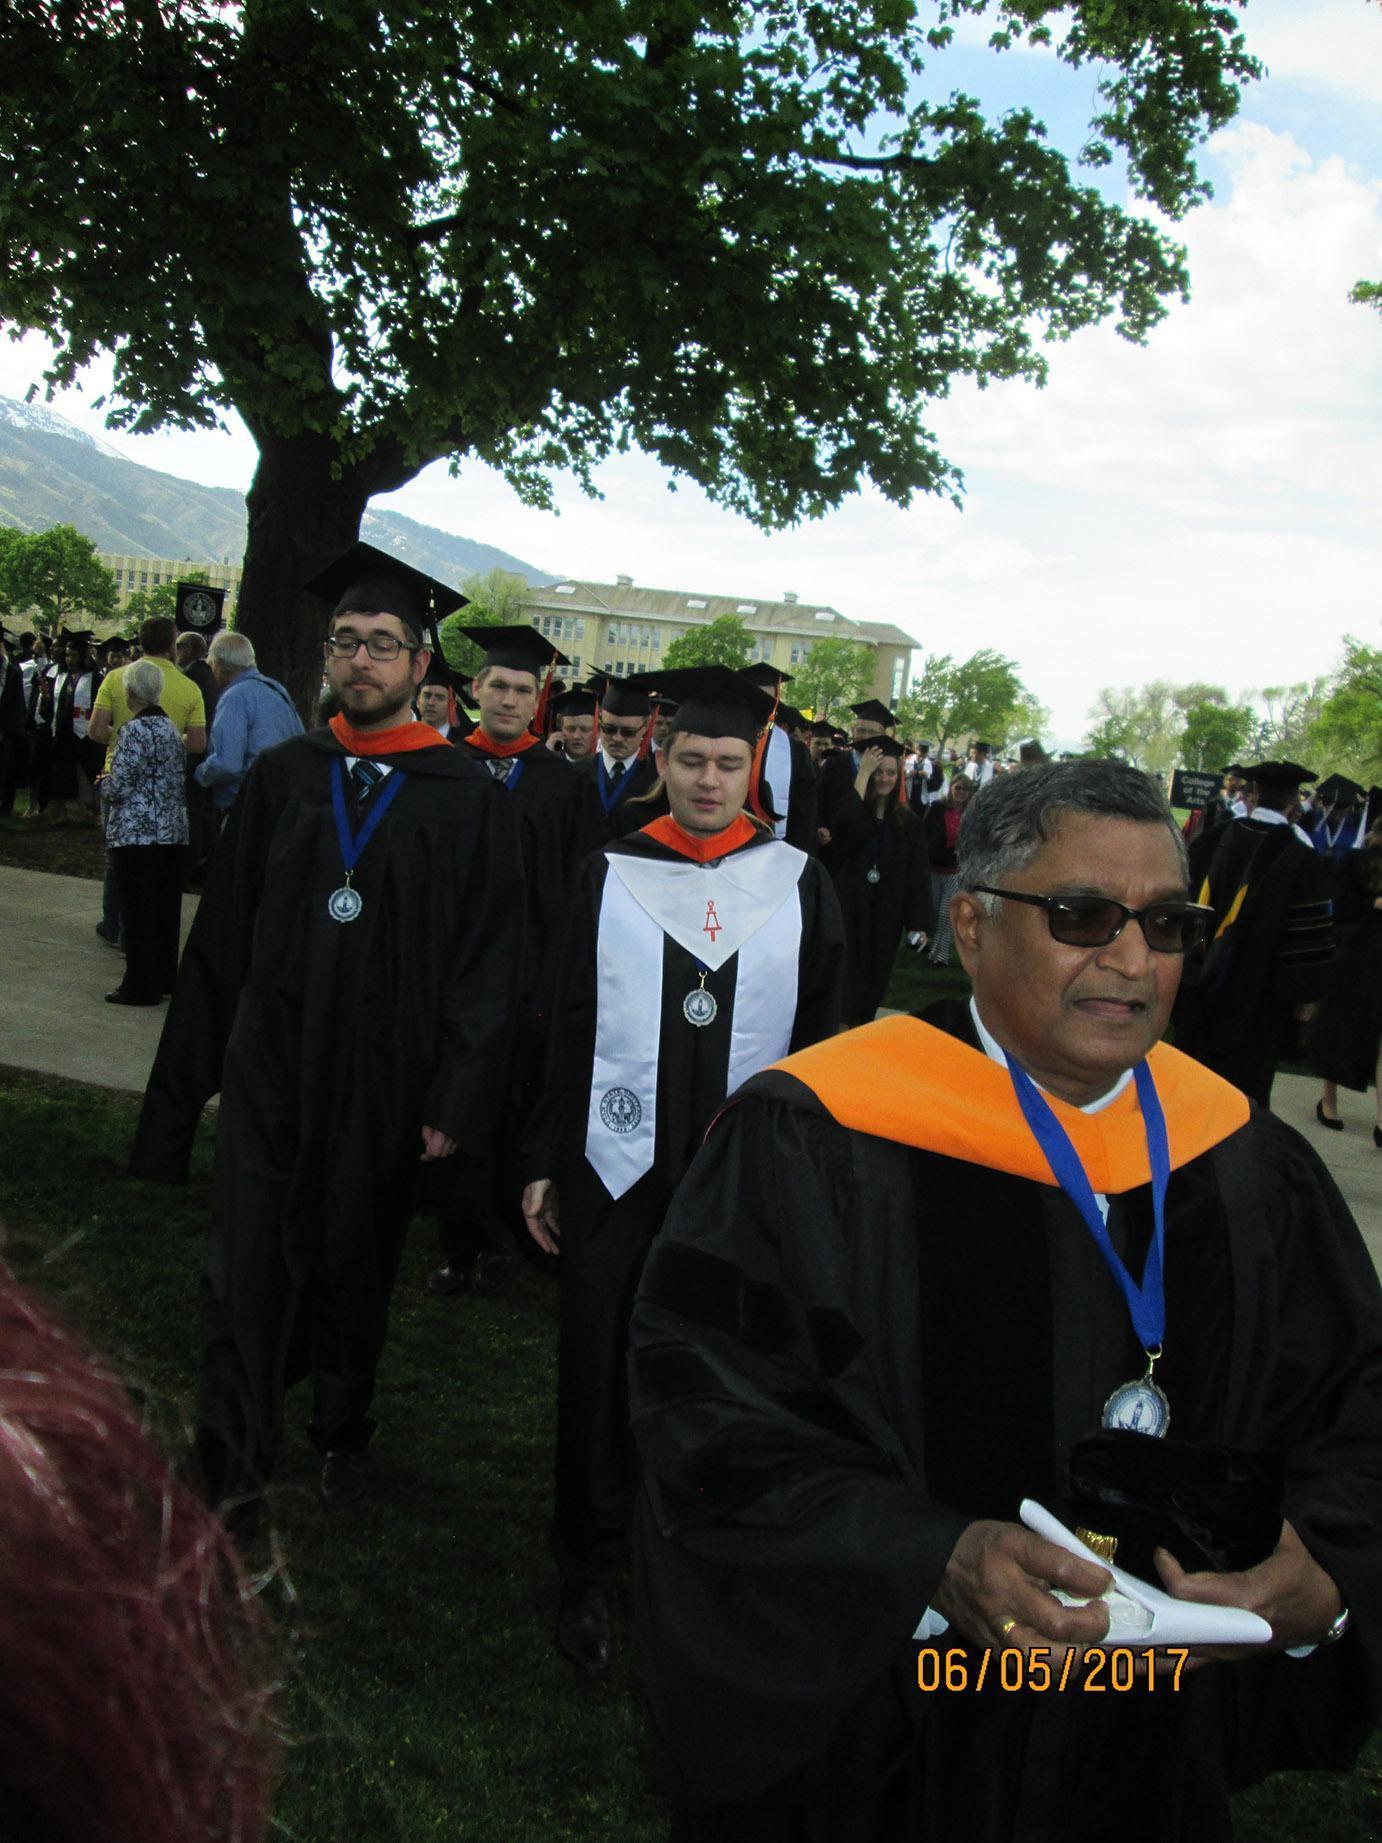 Jagath Kaluarachchi walking with professors